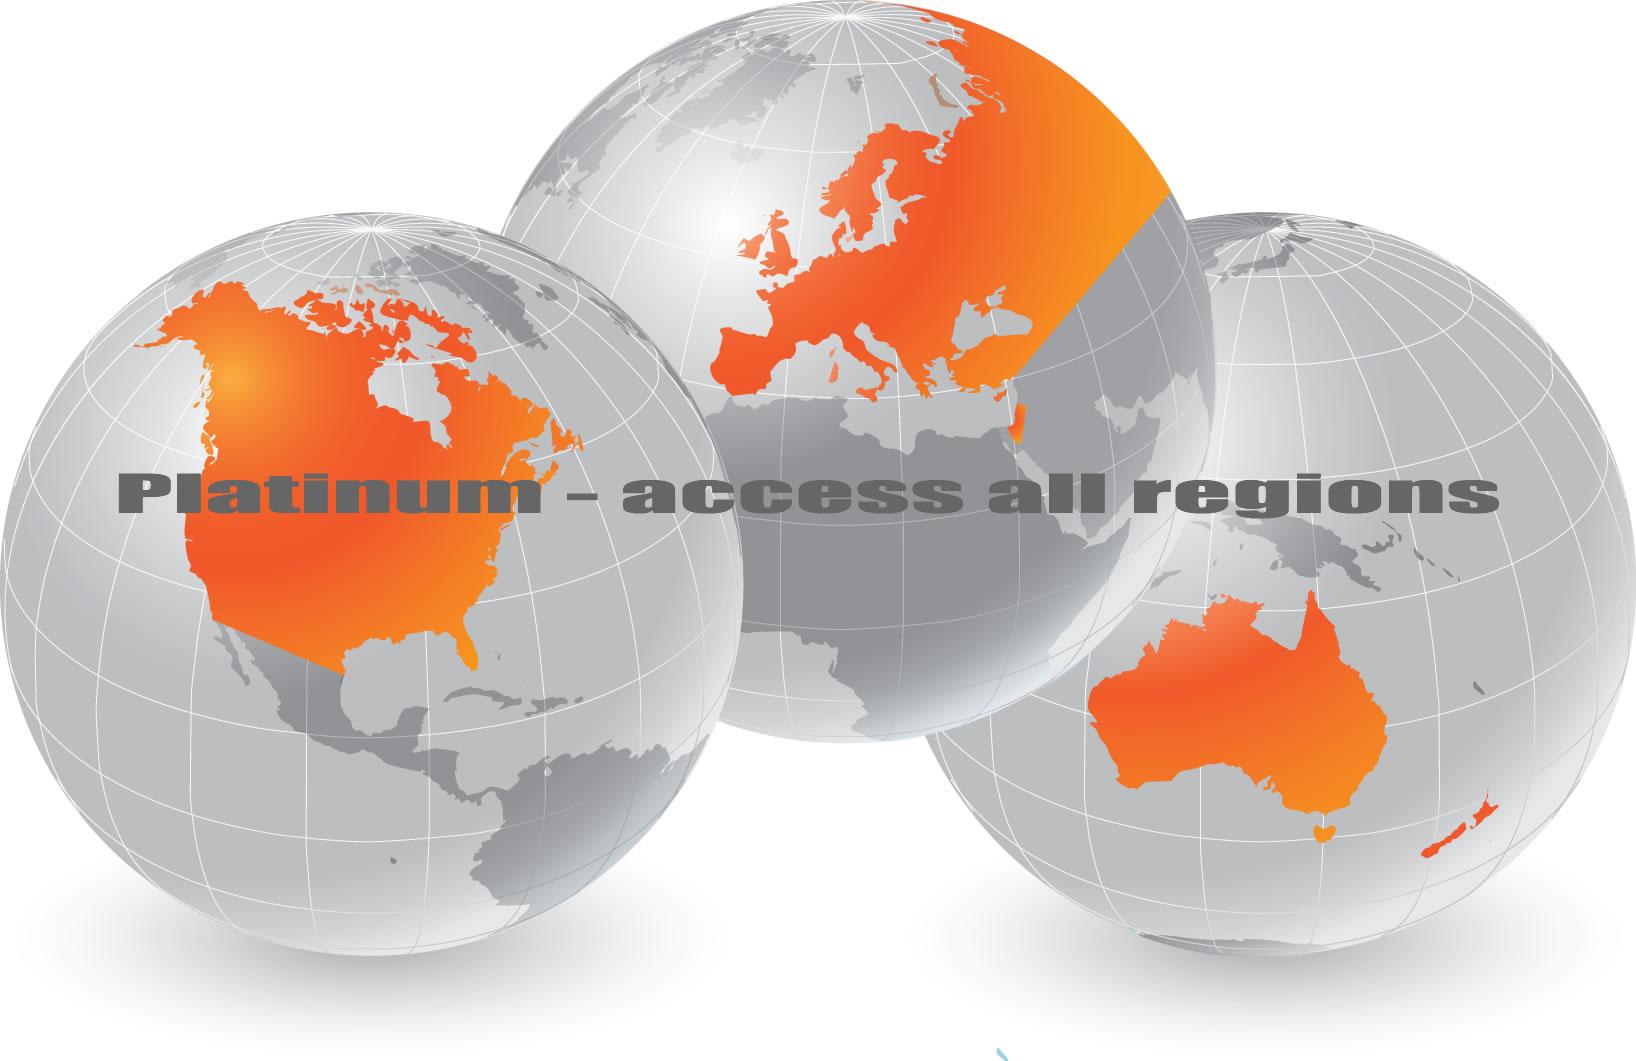 Trinity database Platinum coverage